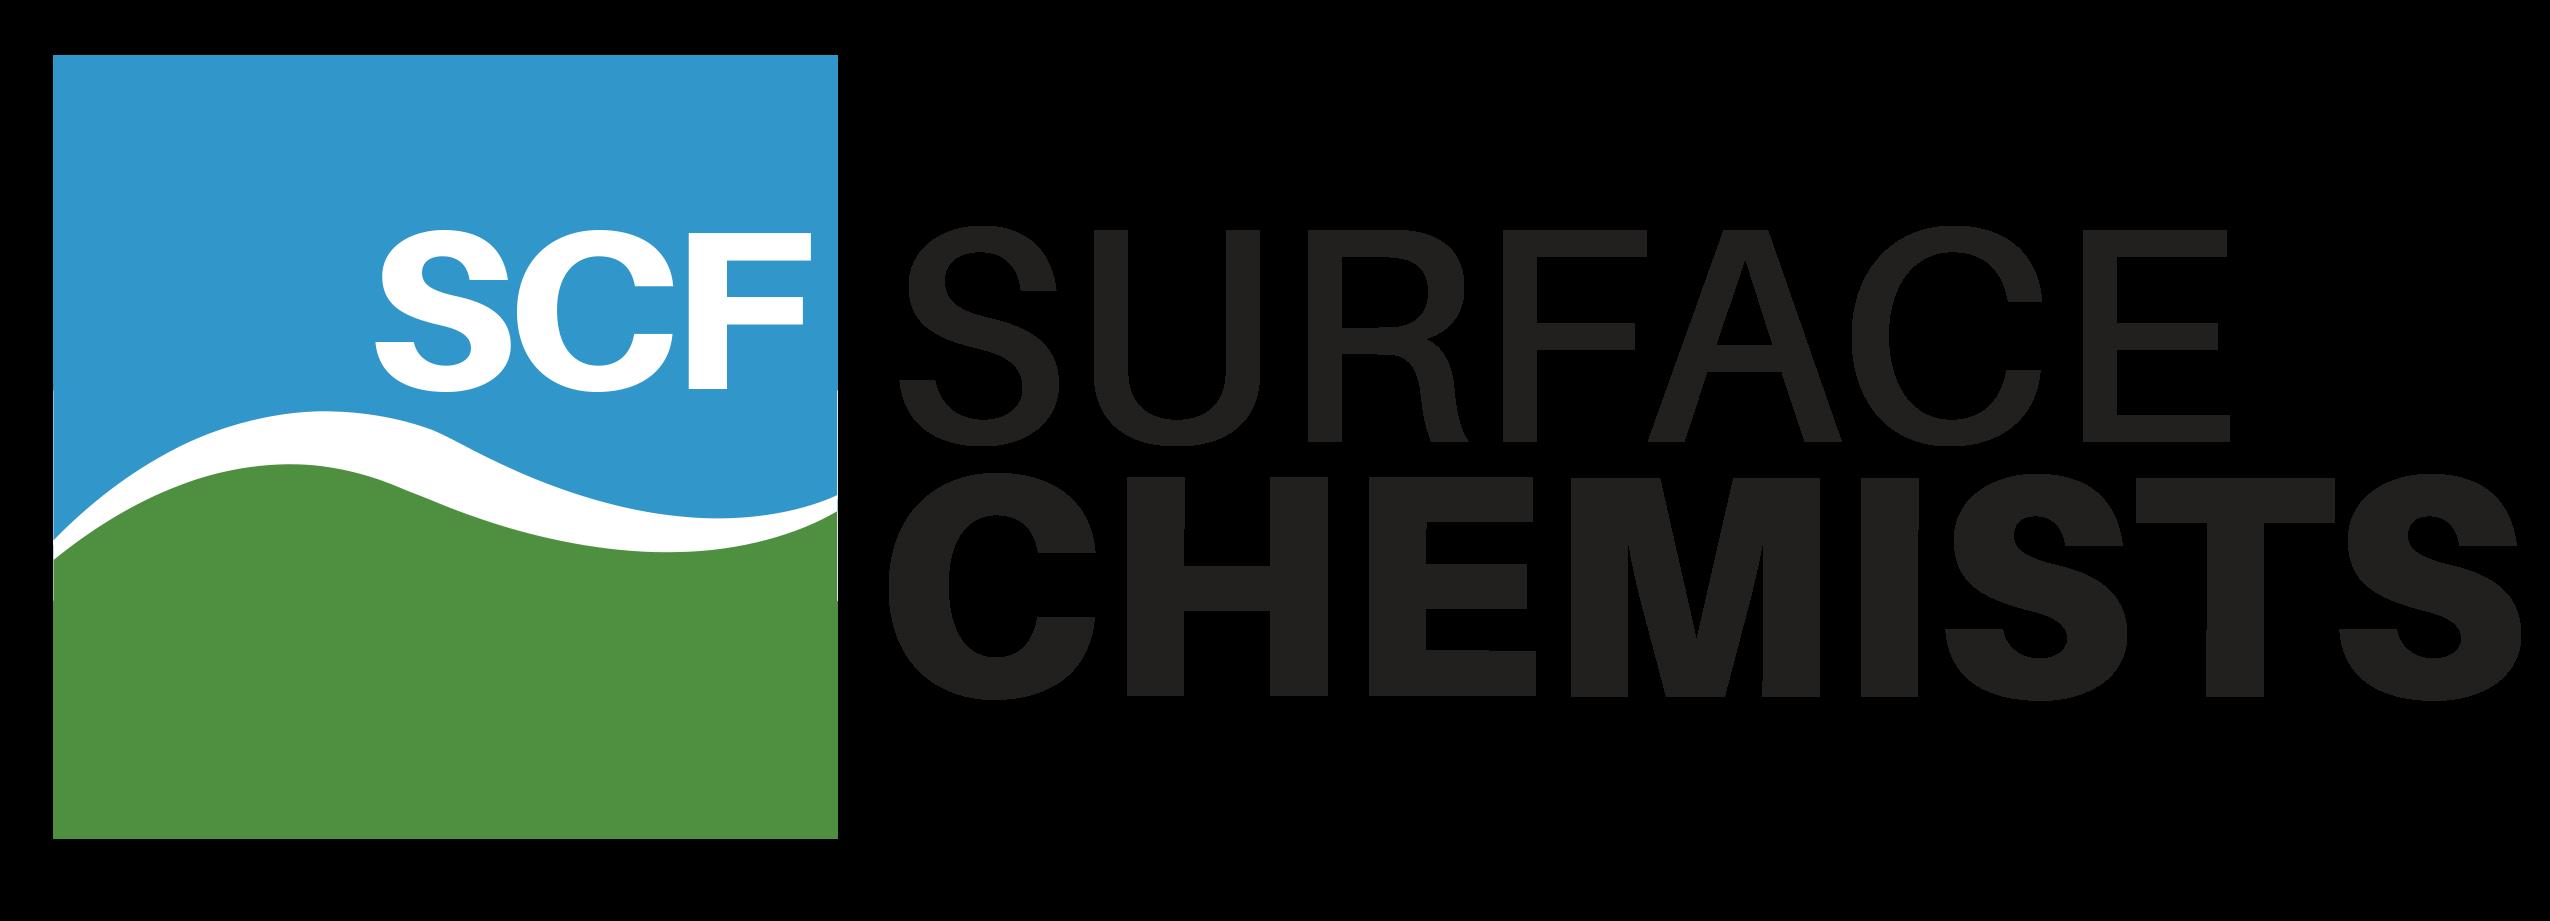 Surface-Chemists